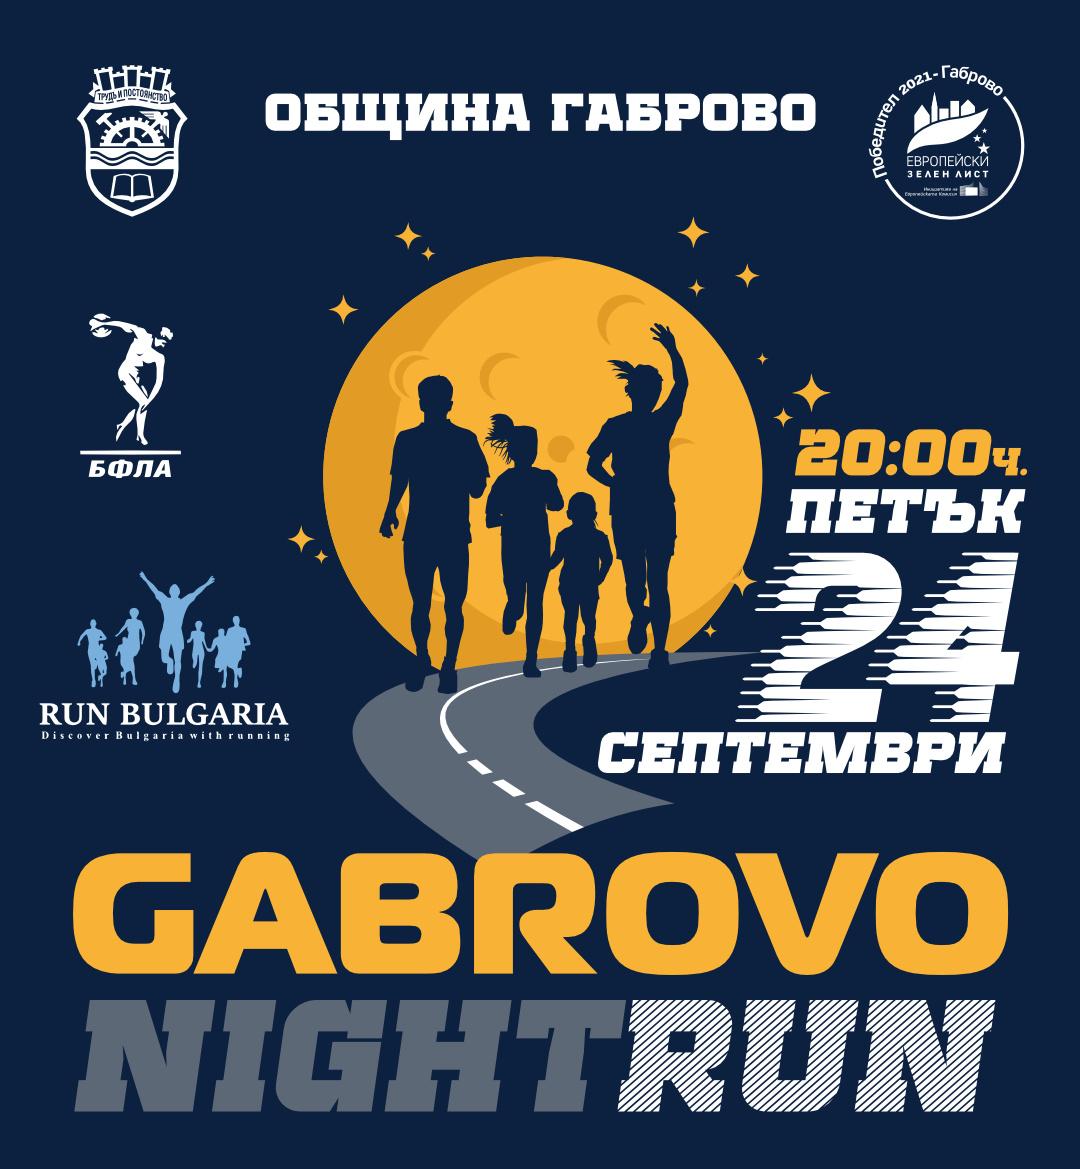 Gabrovo Night Run